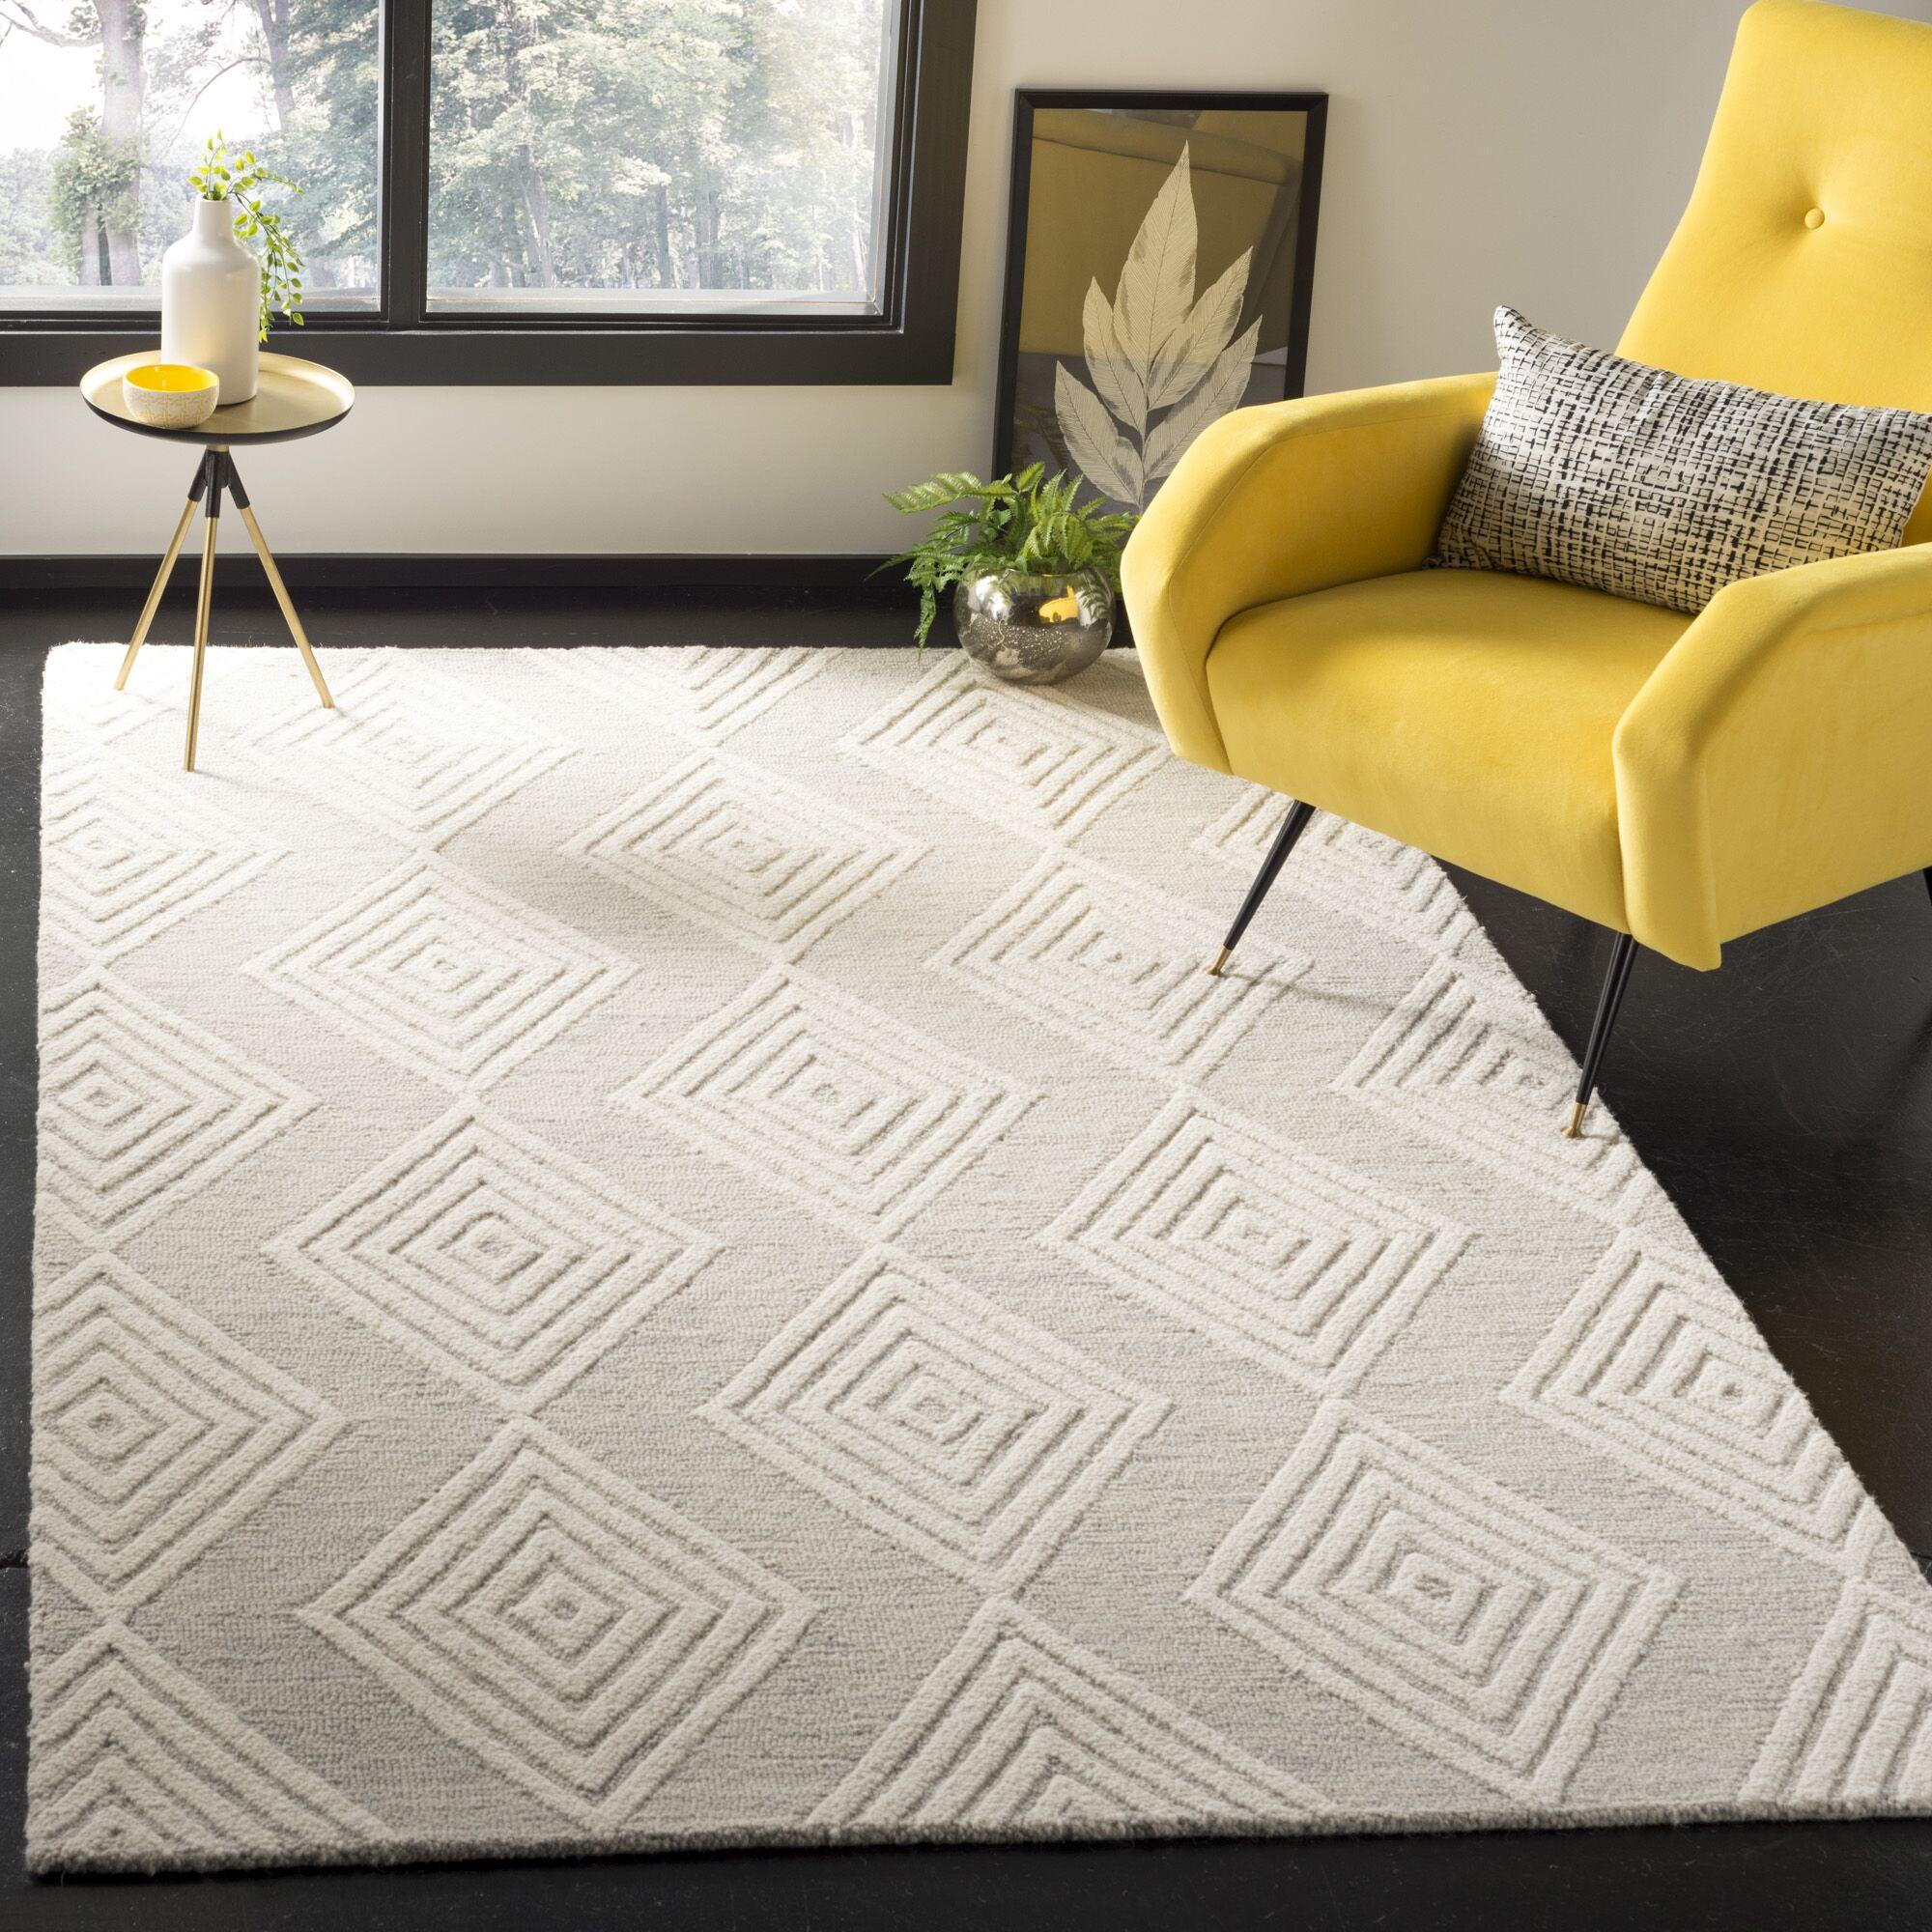 Pizano Hand-Woven Wool Cream/Silver Area Rug Rug Size: Rectangular 5' x 8'